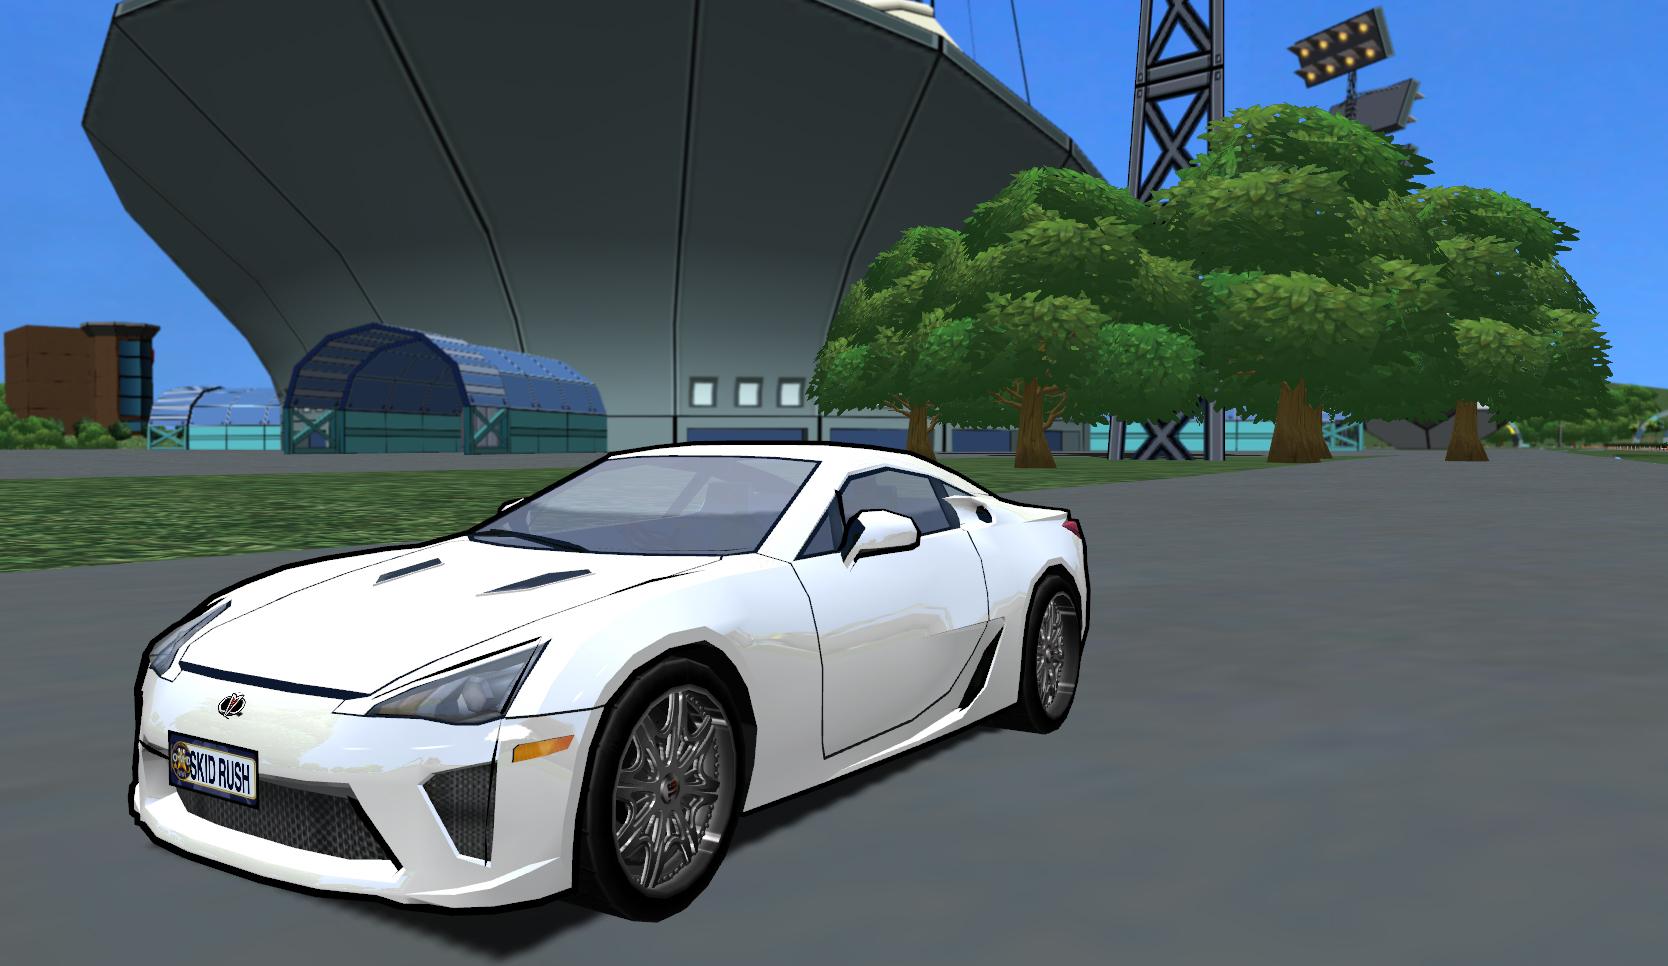 Lexus-LFA 원본1-1.jpg